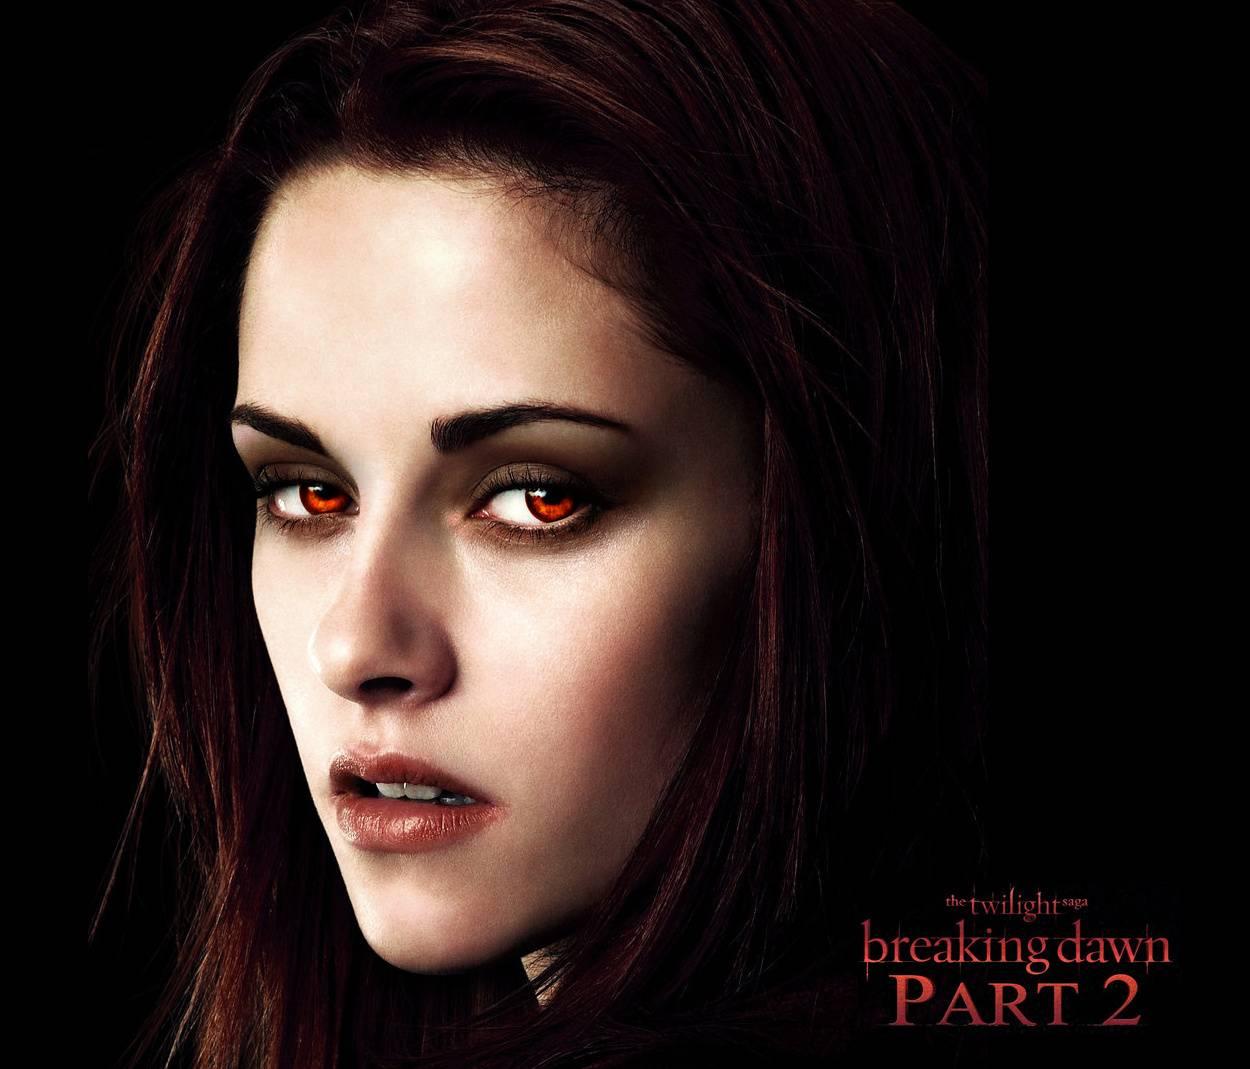 Bella Twilight Break